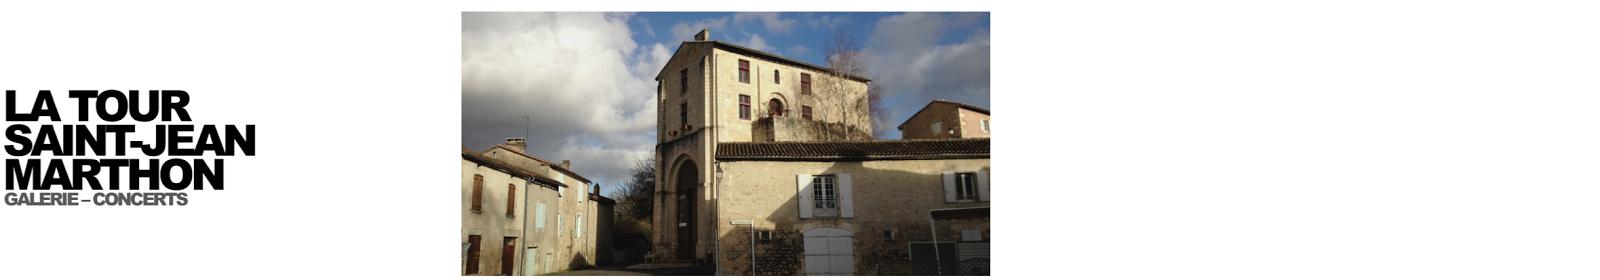 La Tour Saint Jean Marthon